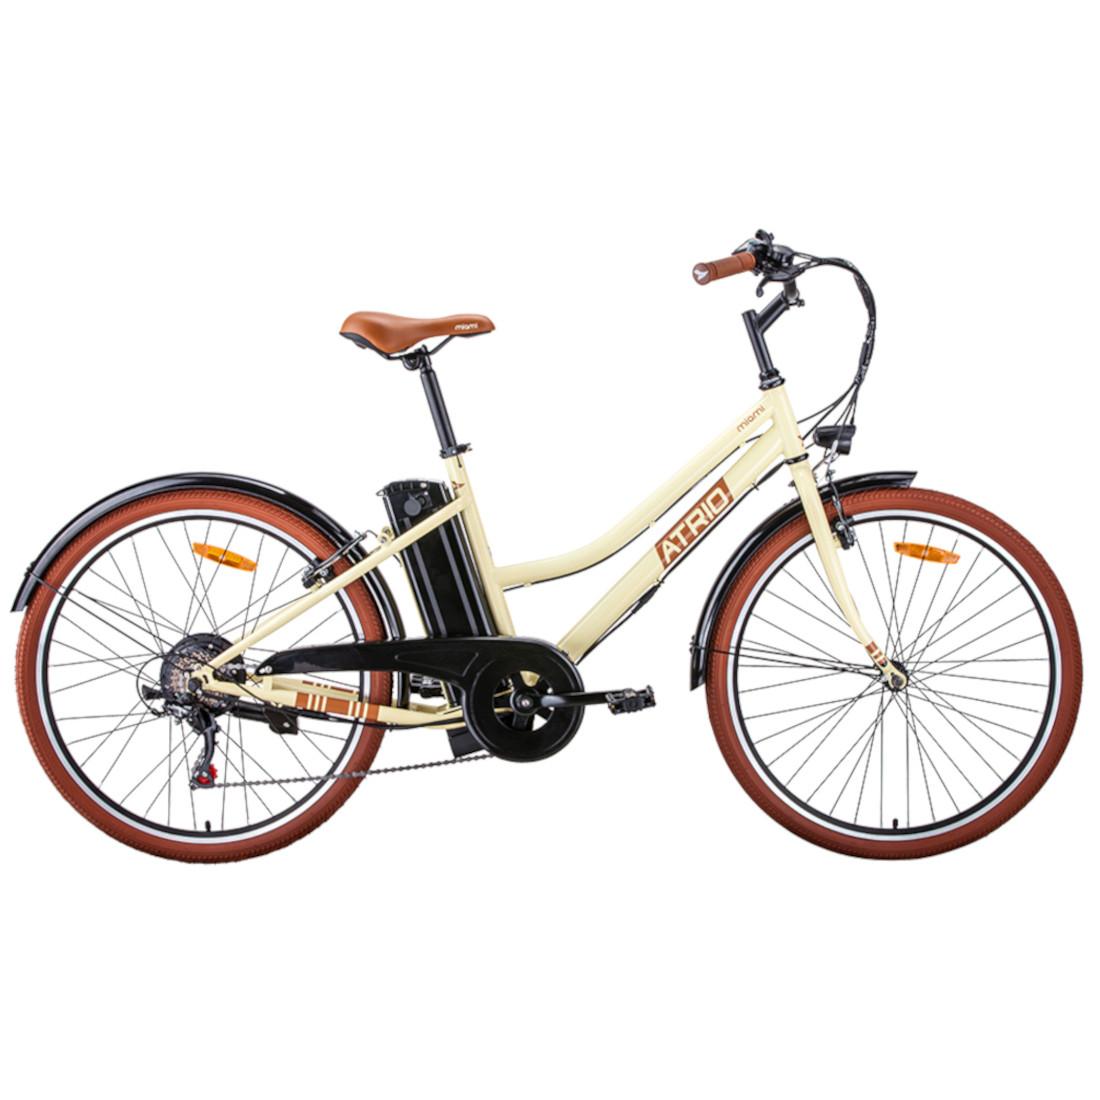 Bicicleta Elétrica Aro 26 Retrô Vintage 6V 350W Shimano